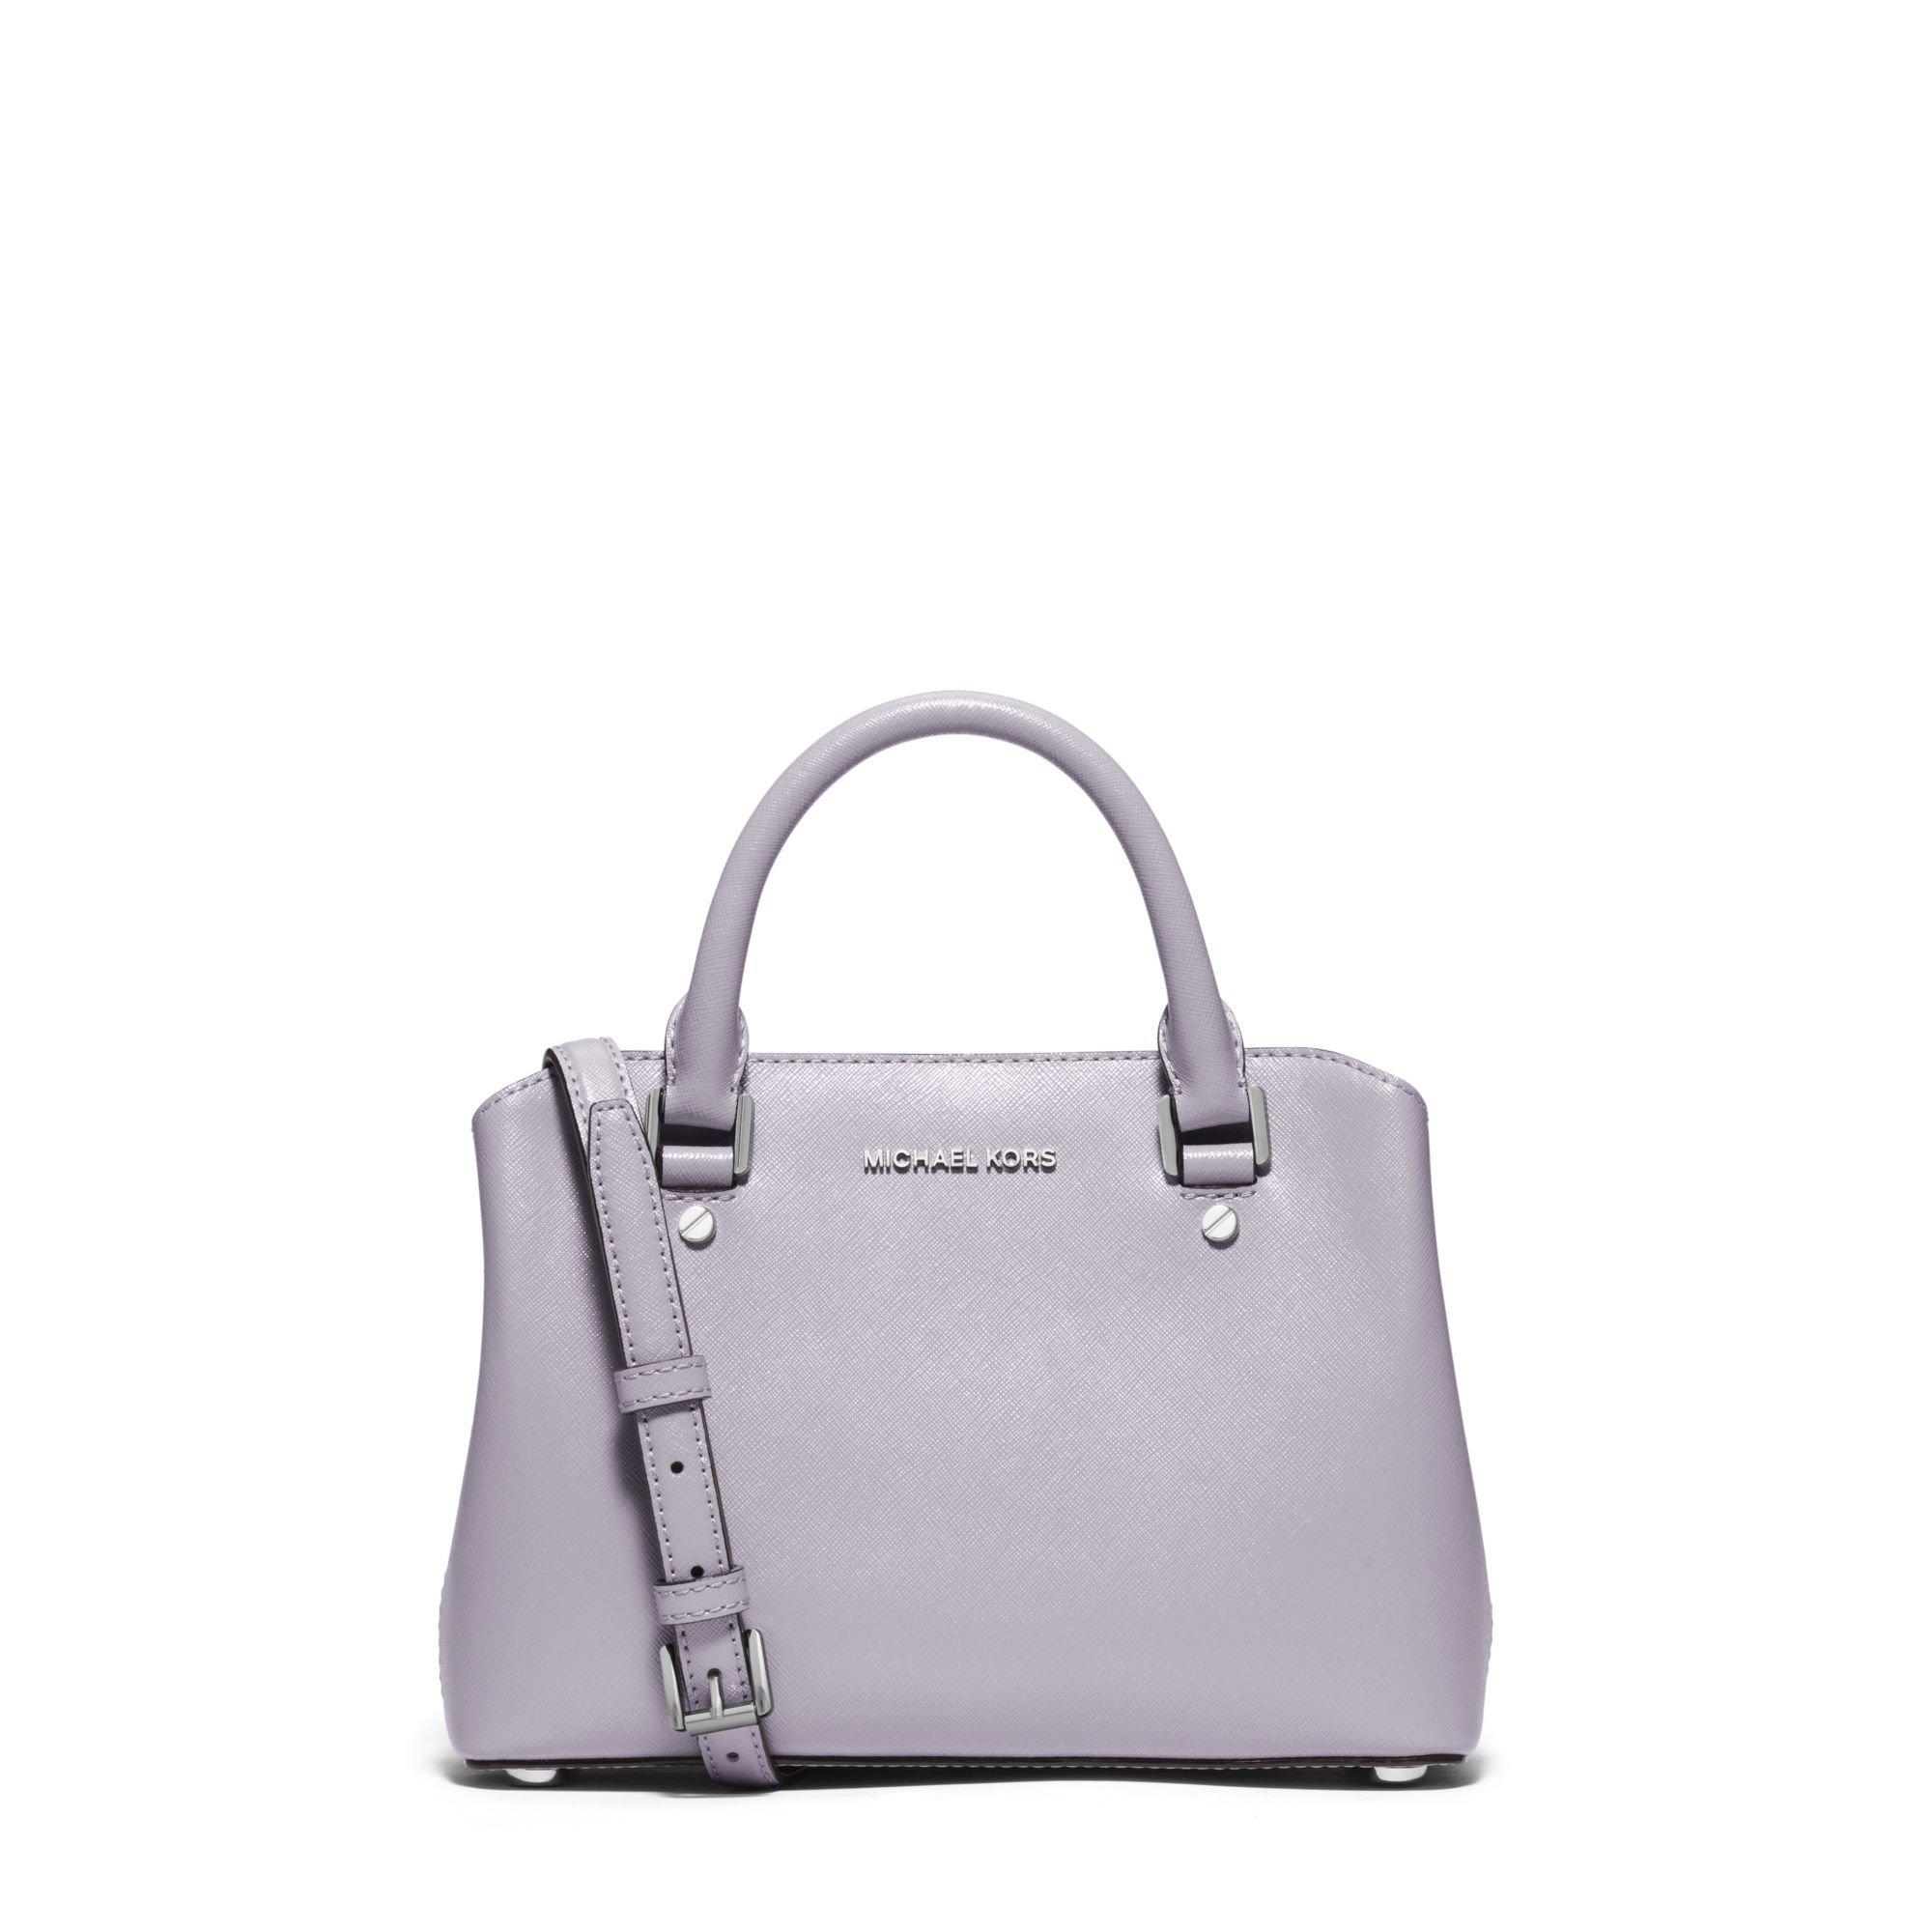 1a339fcb21b9 Michael Kors Savannah Small Patent-leather Satchel in Purple - Lyst